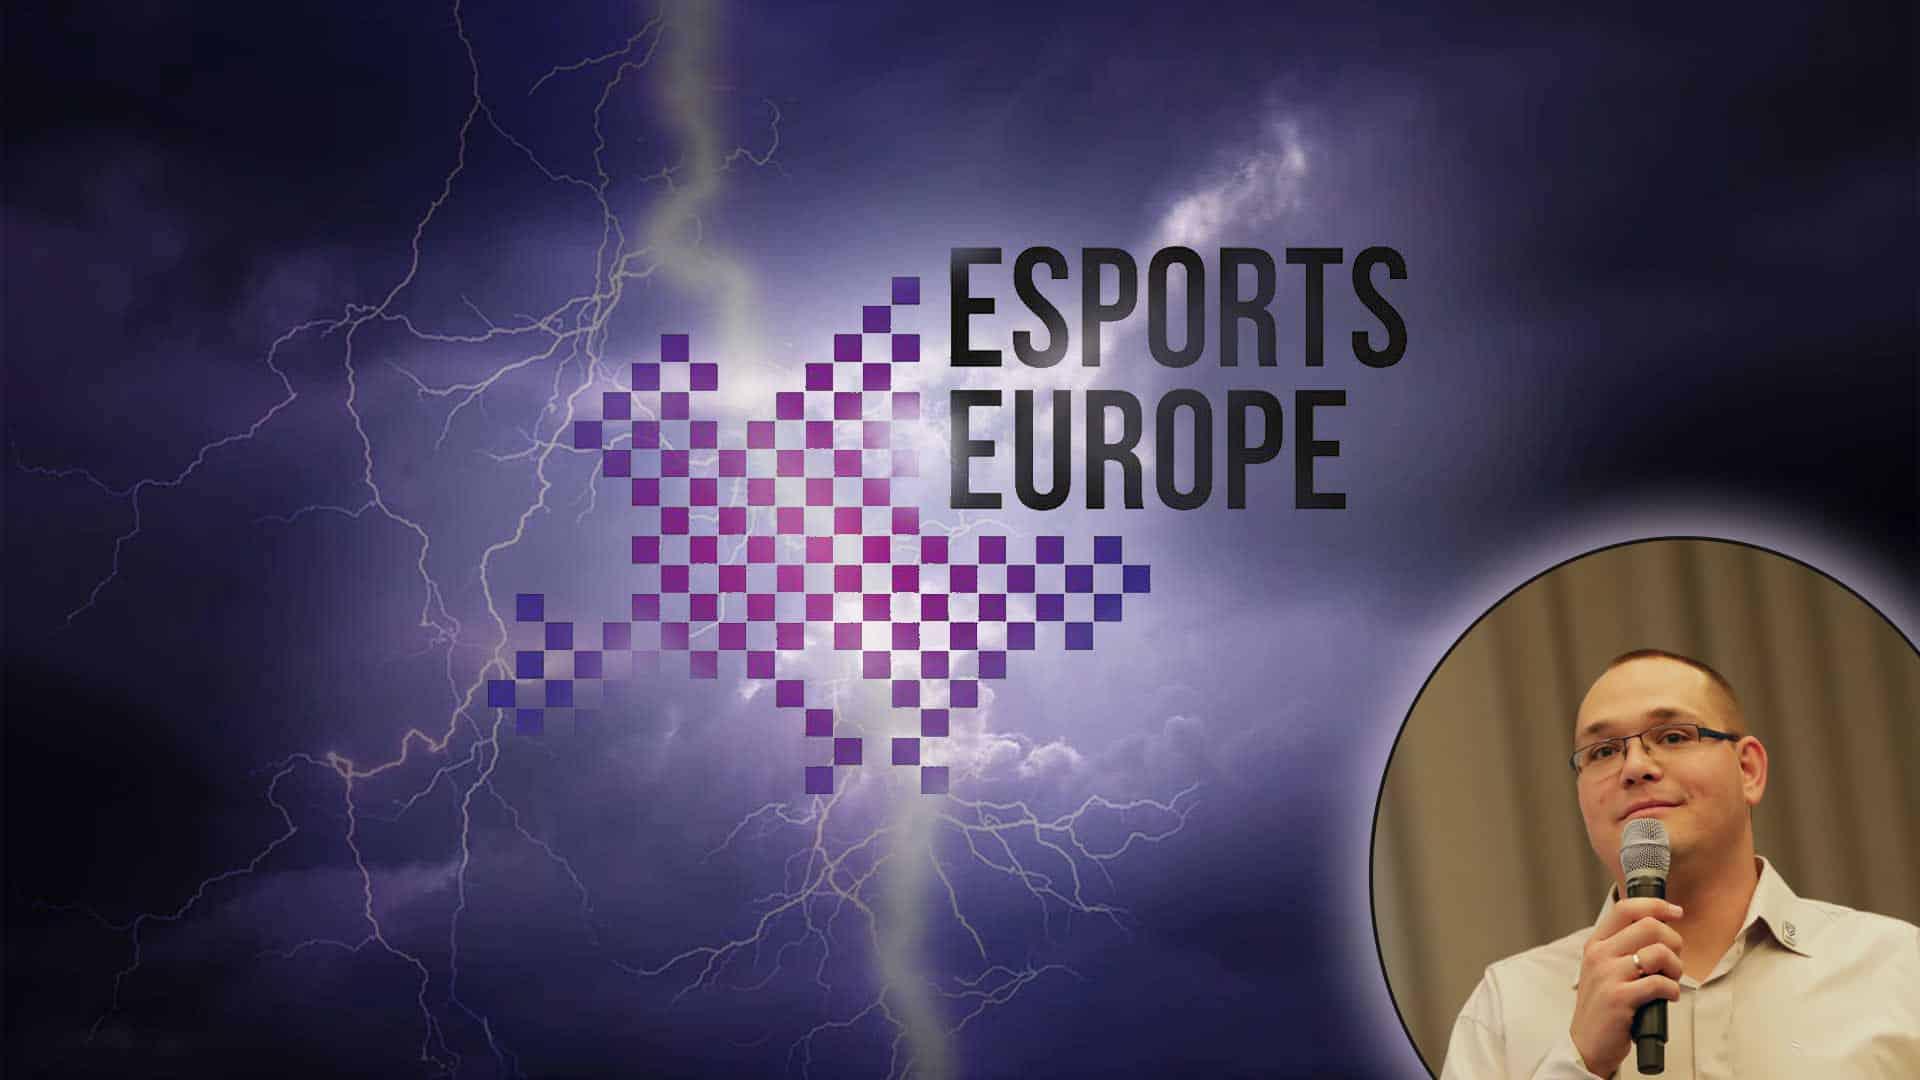 esports europe kritik interview andreas